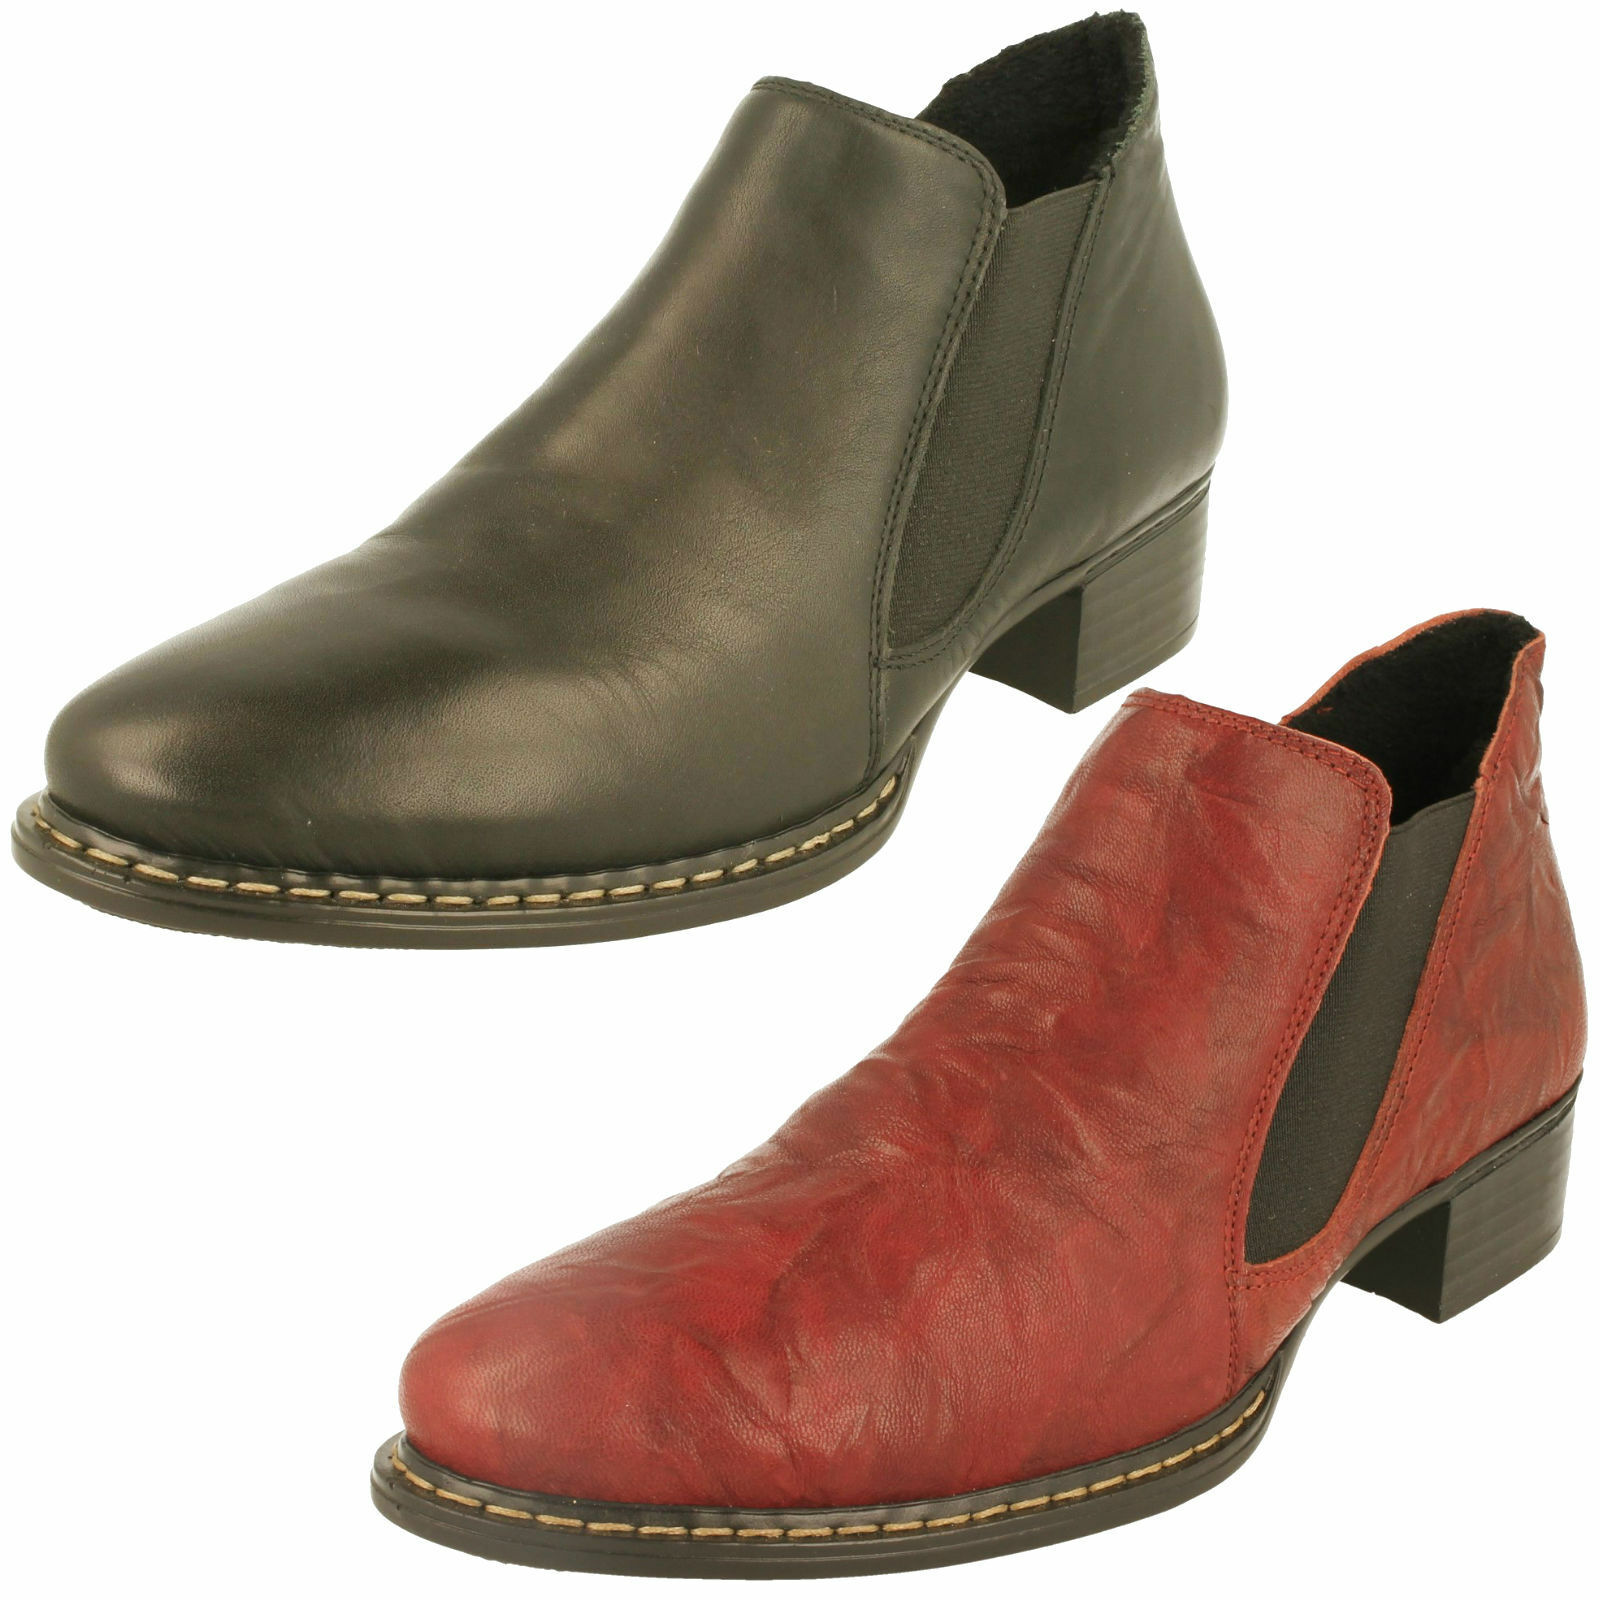 Ladies Rieker Ankle Boots - 53680